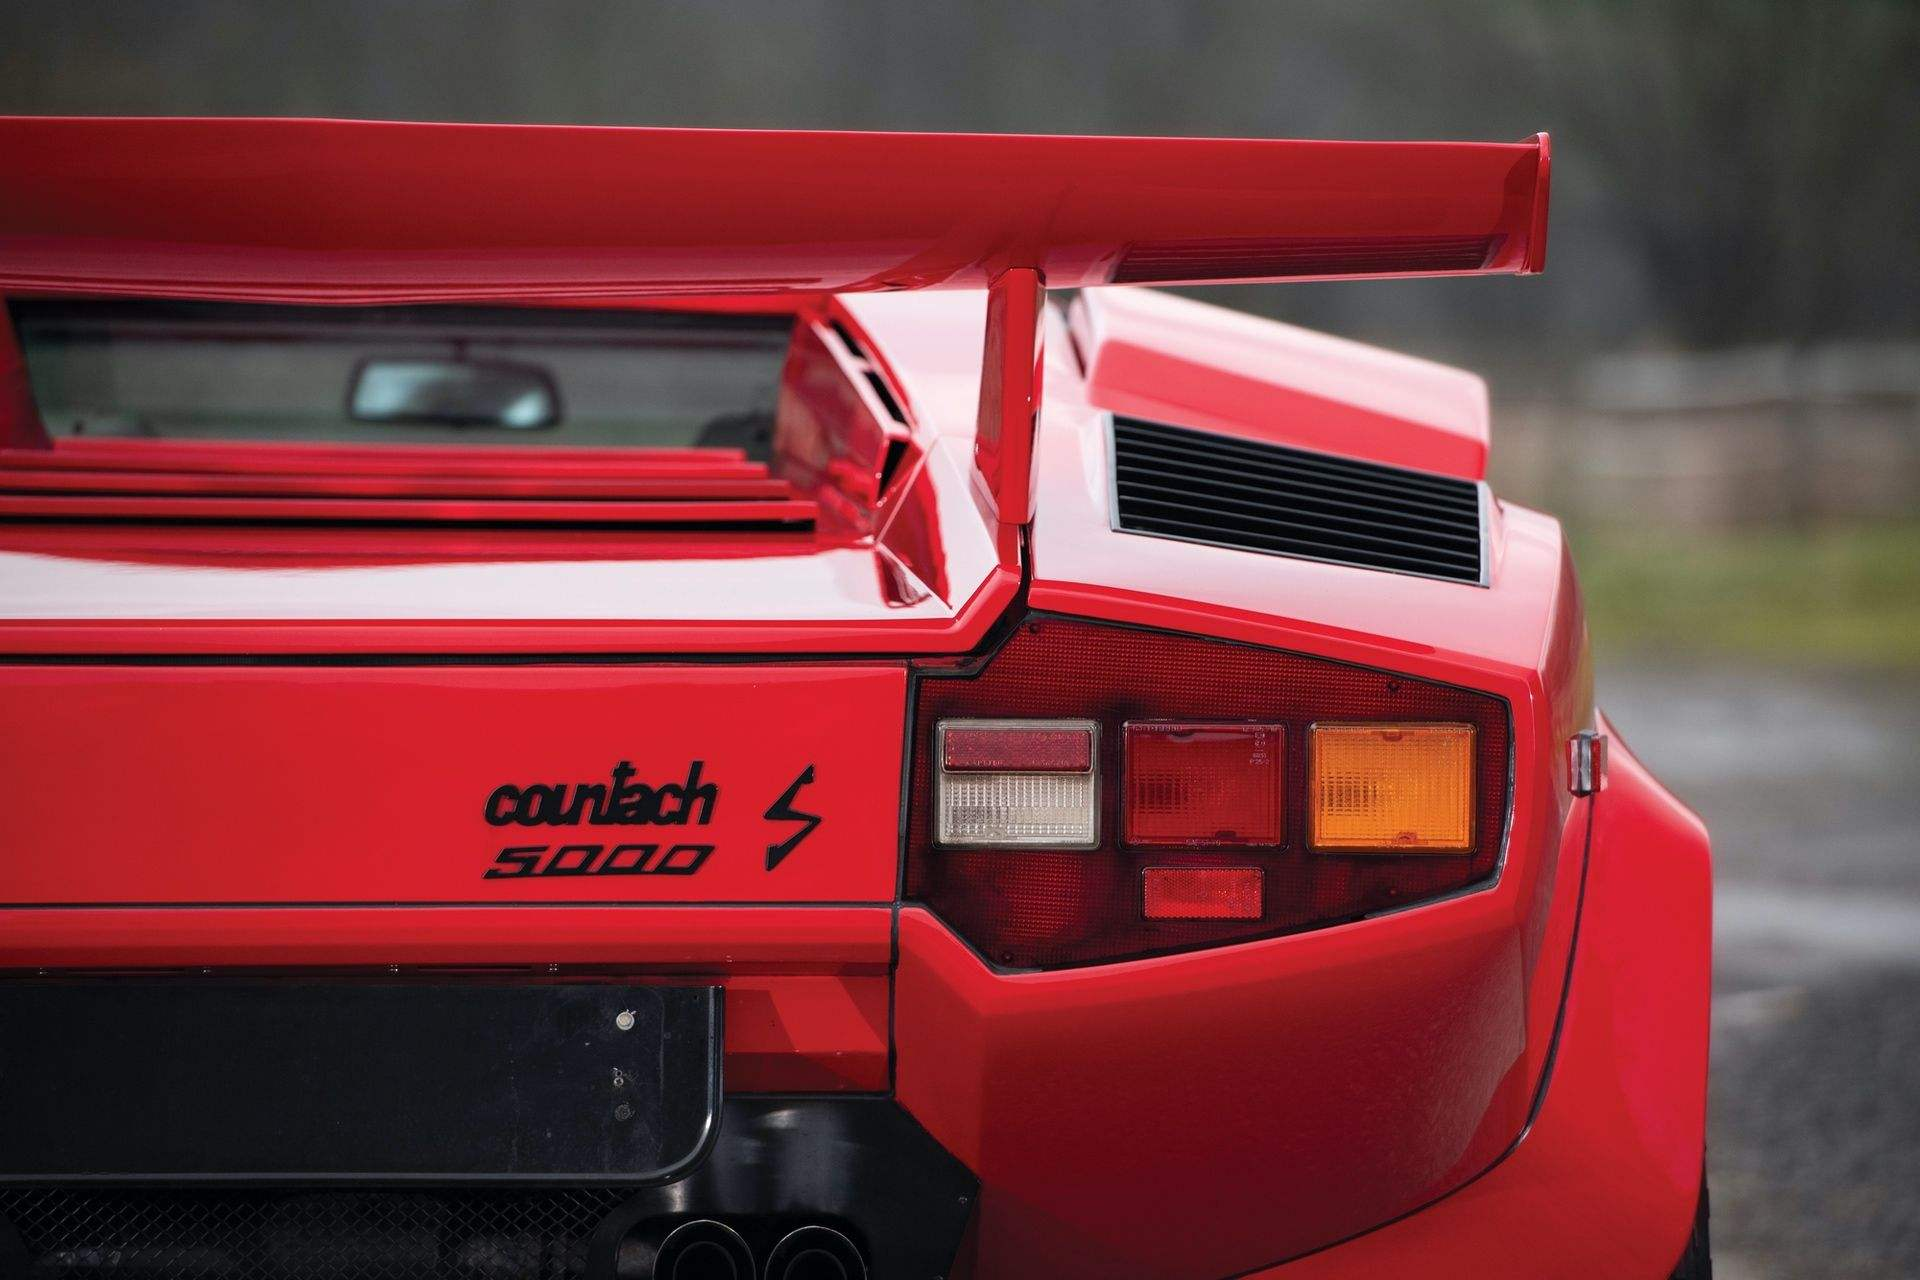 Lamborghini_Countach_5000S_0008